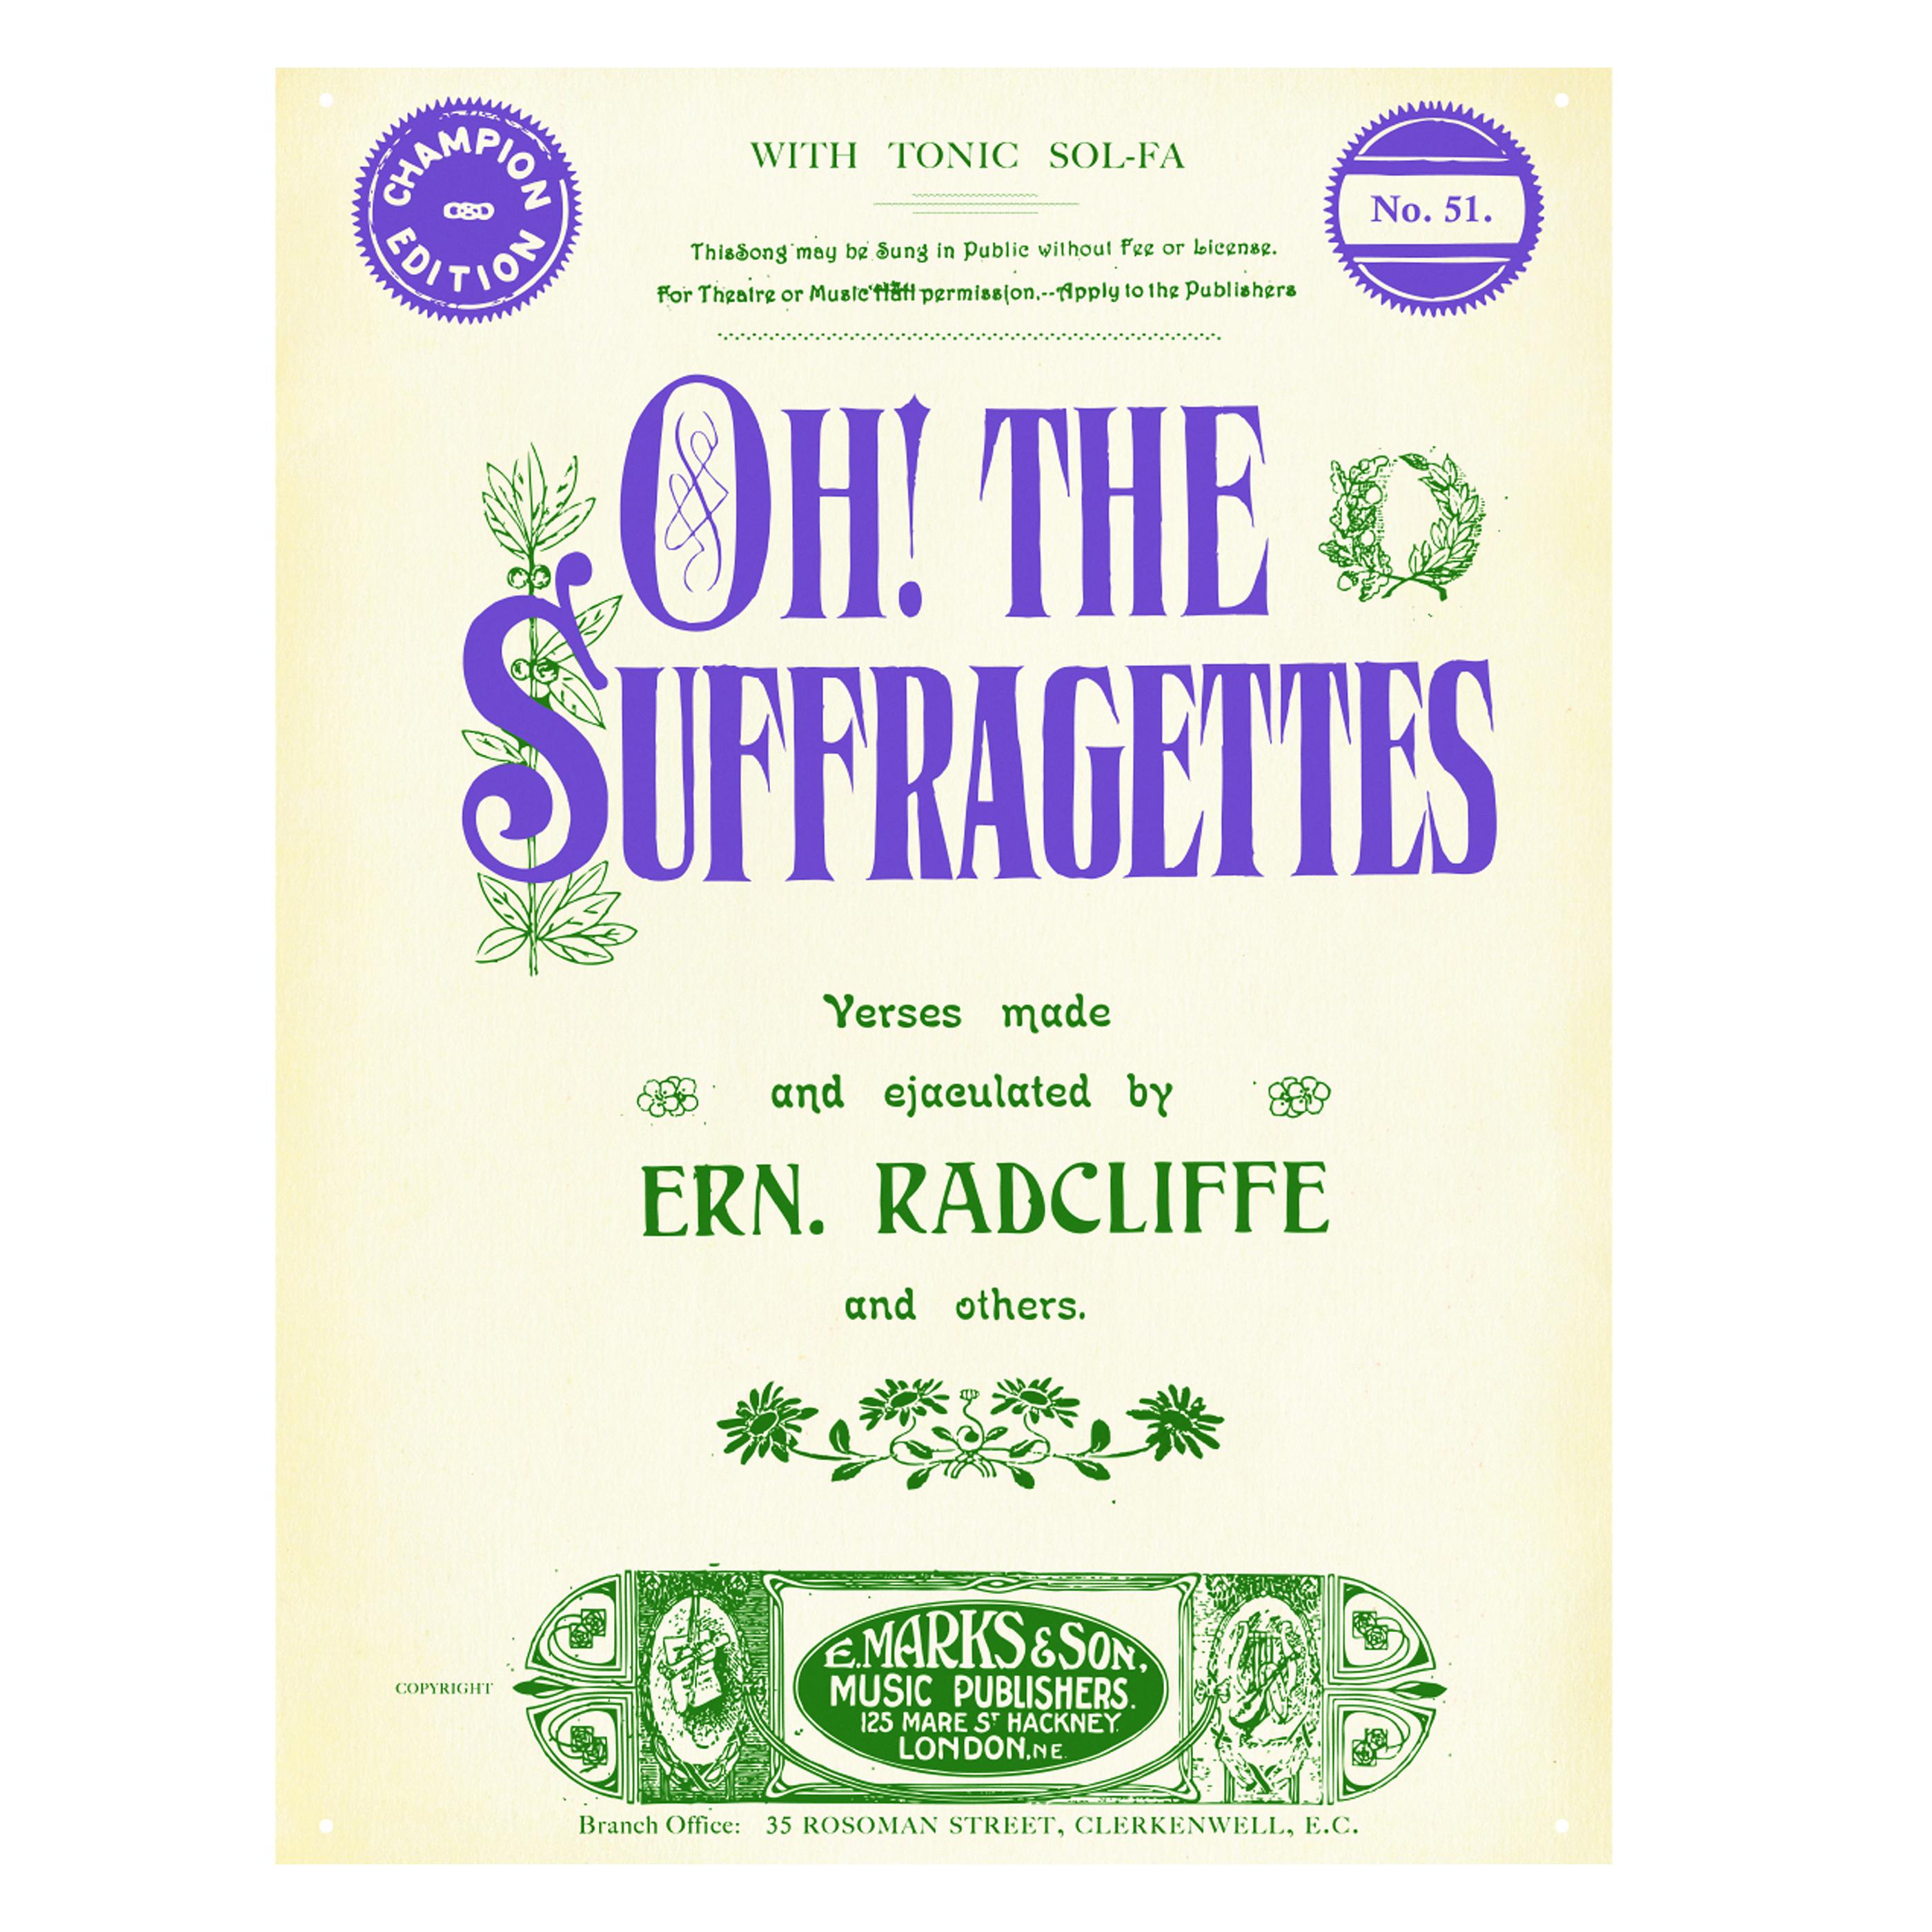 Suffragette movement tin